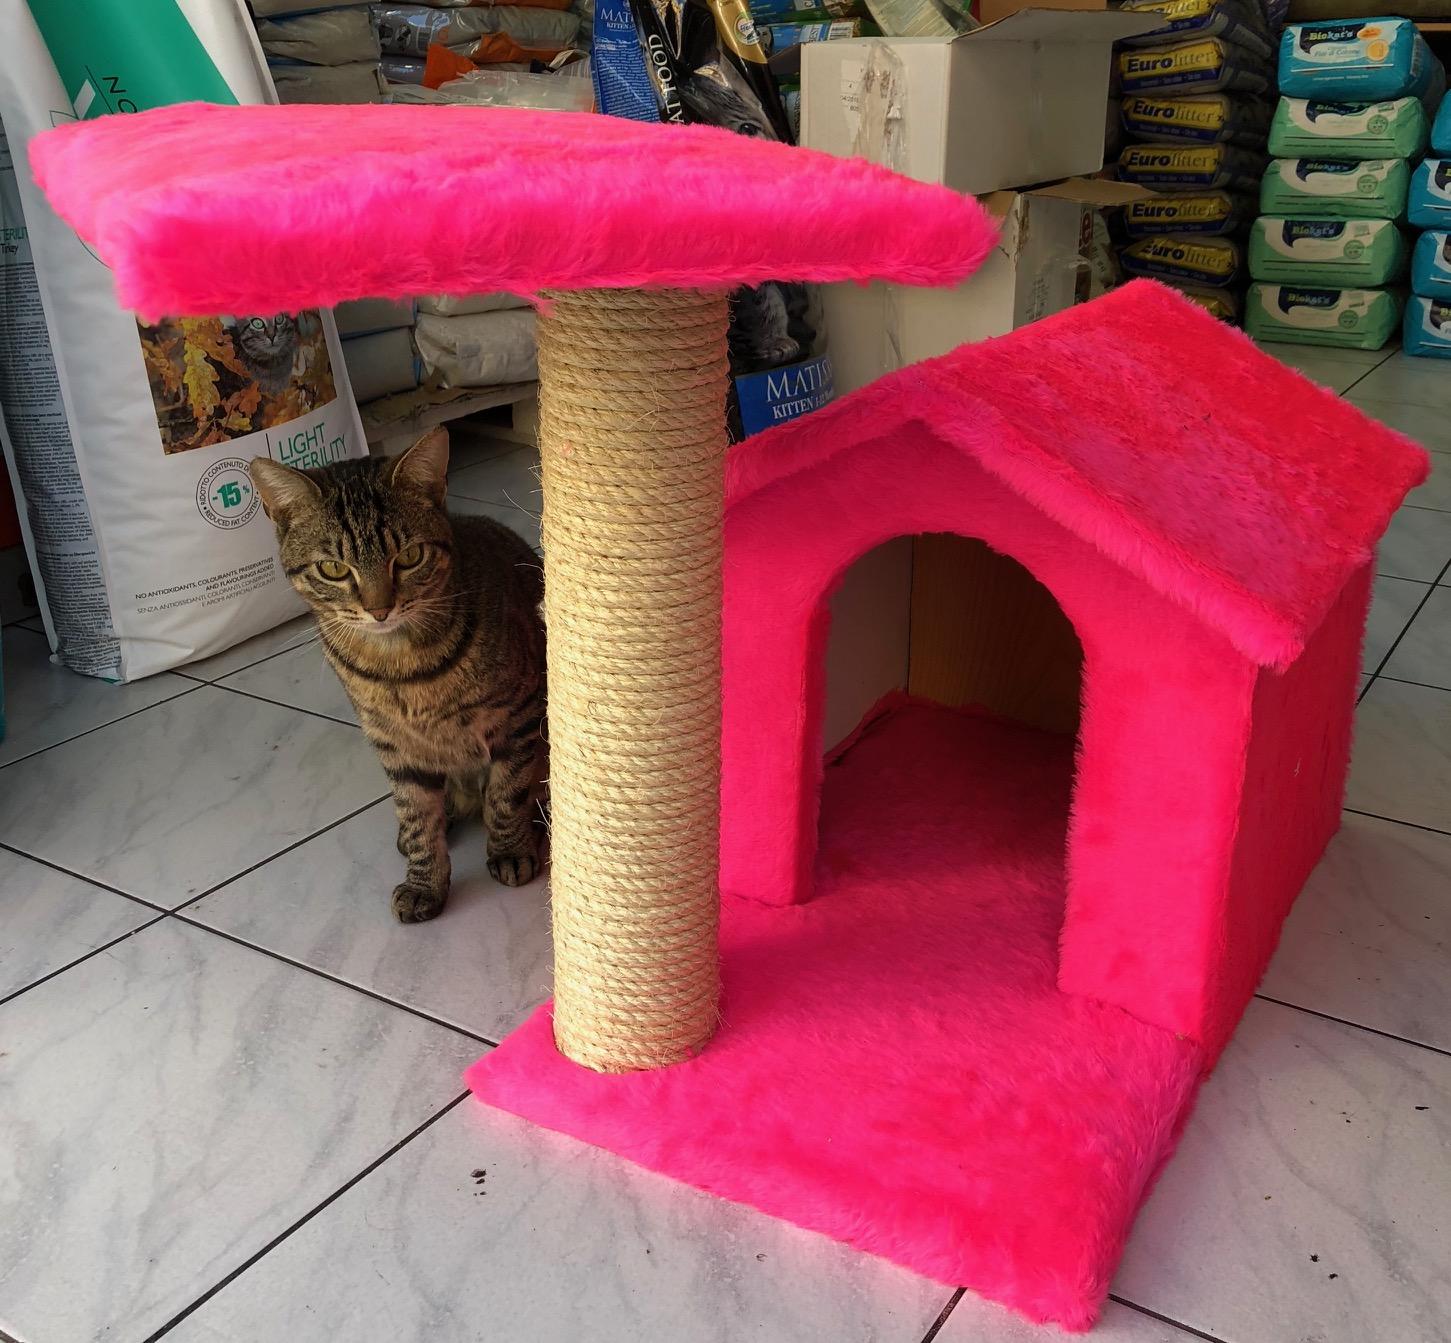 8c6c892d36a4 Σπιτάκι ονυχοδρόμιο γάτας ελληνικής κατασκευής